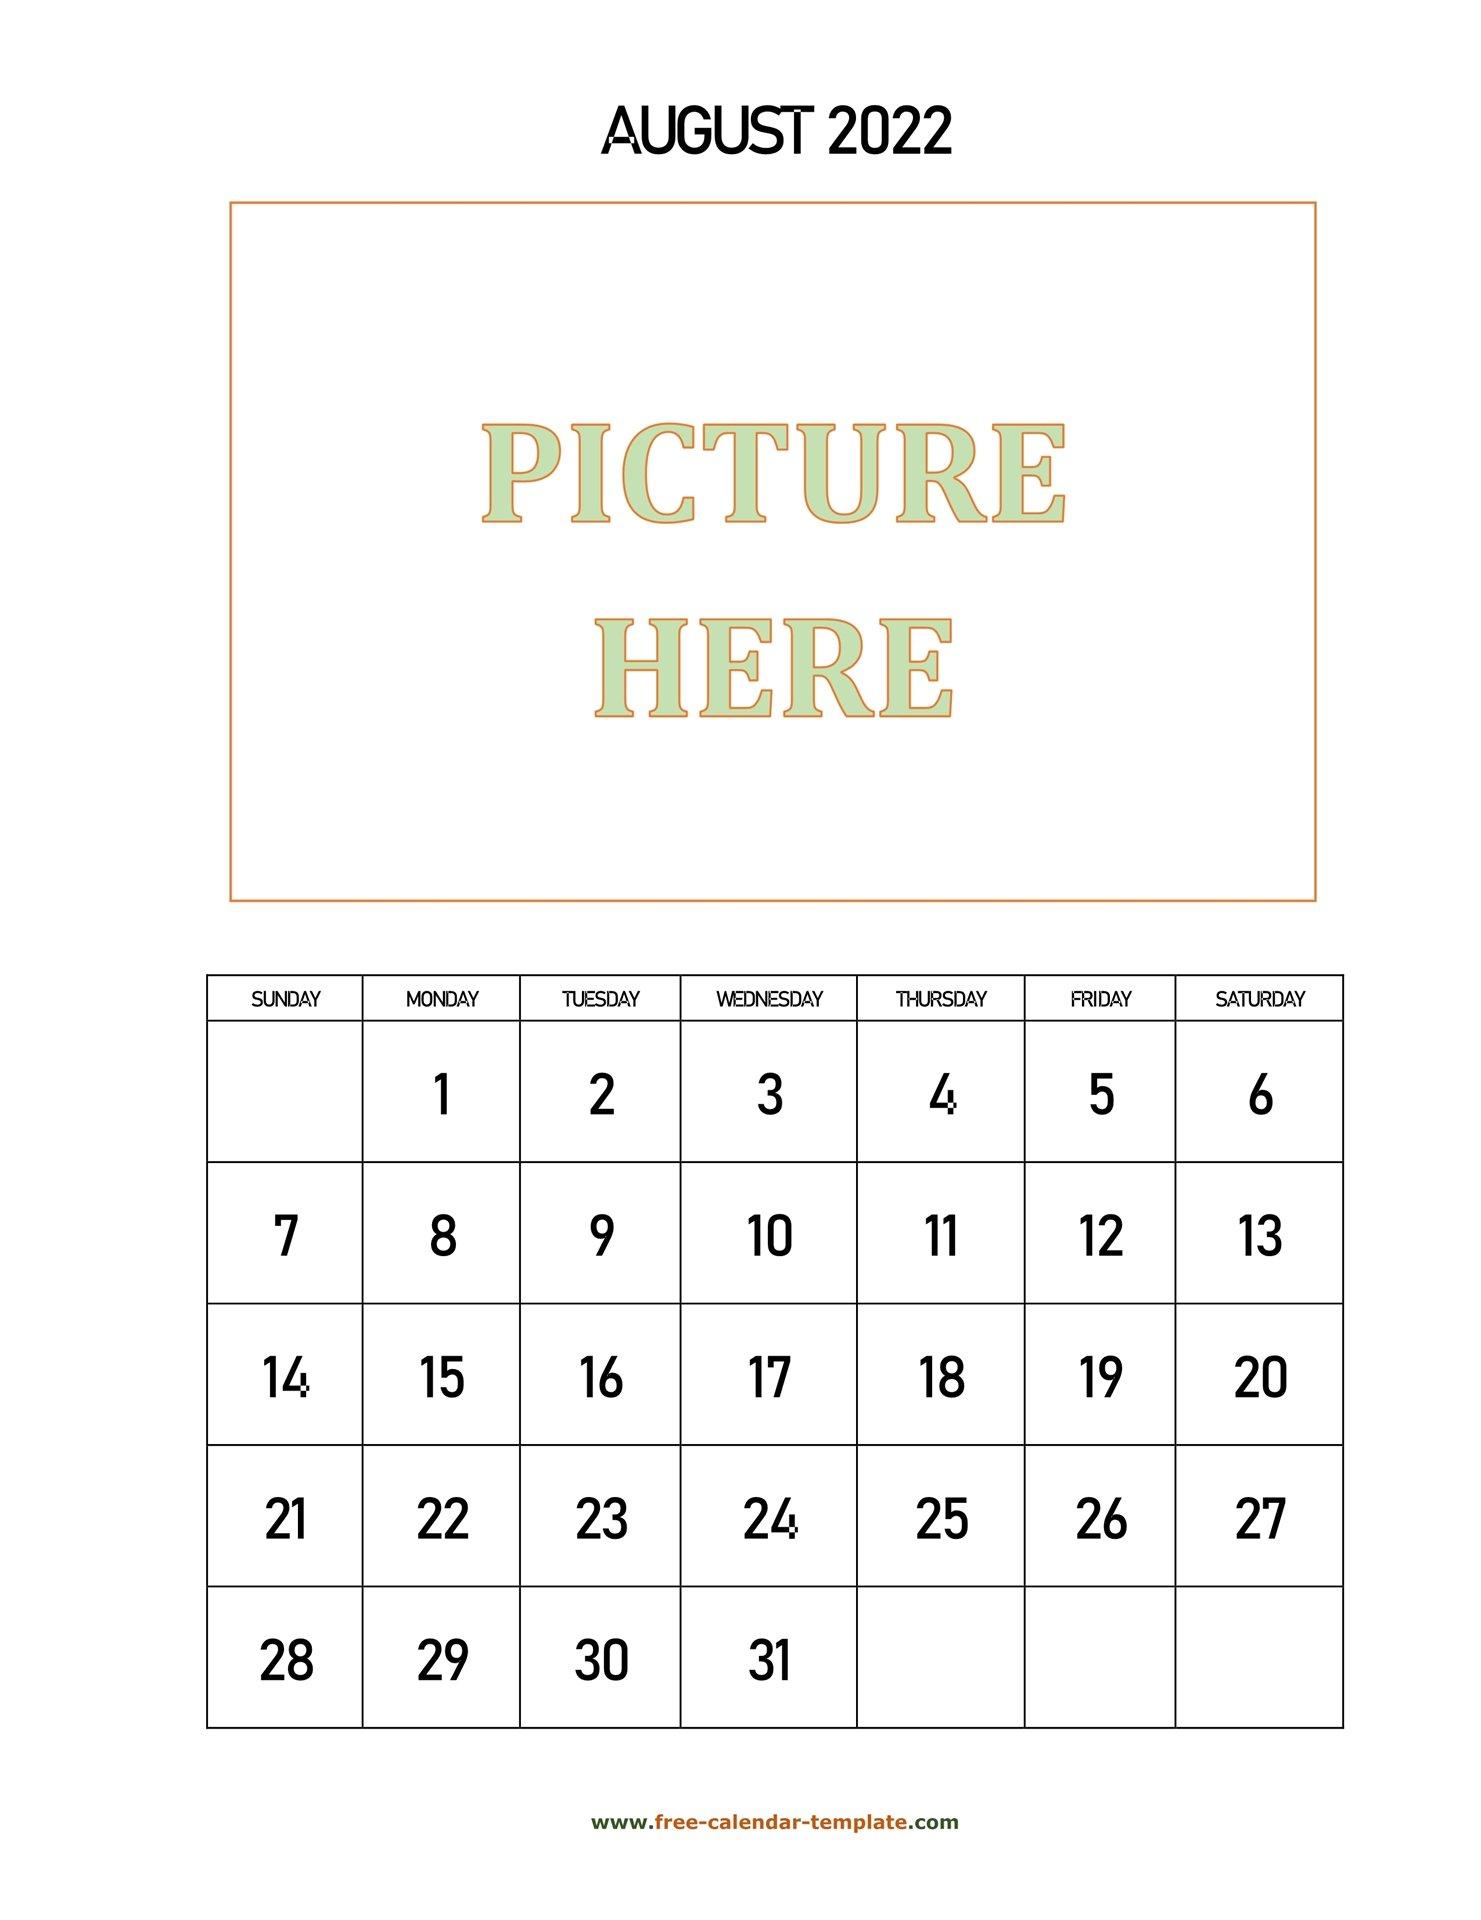 August Printable 2022 Calendar, Space For Add Picture within Printable Monthly Calendar August 2022